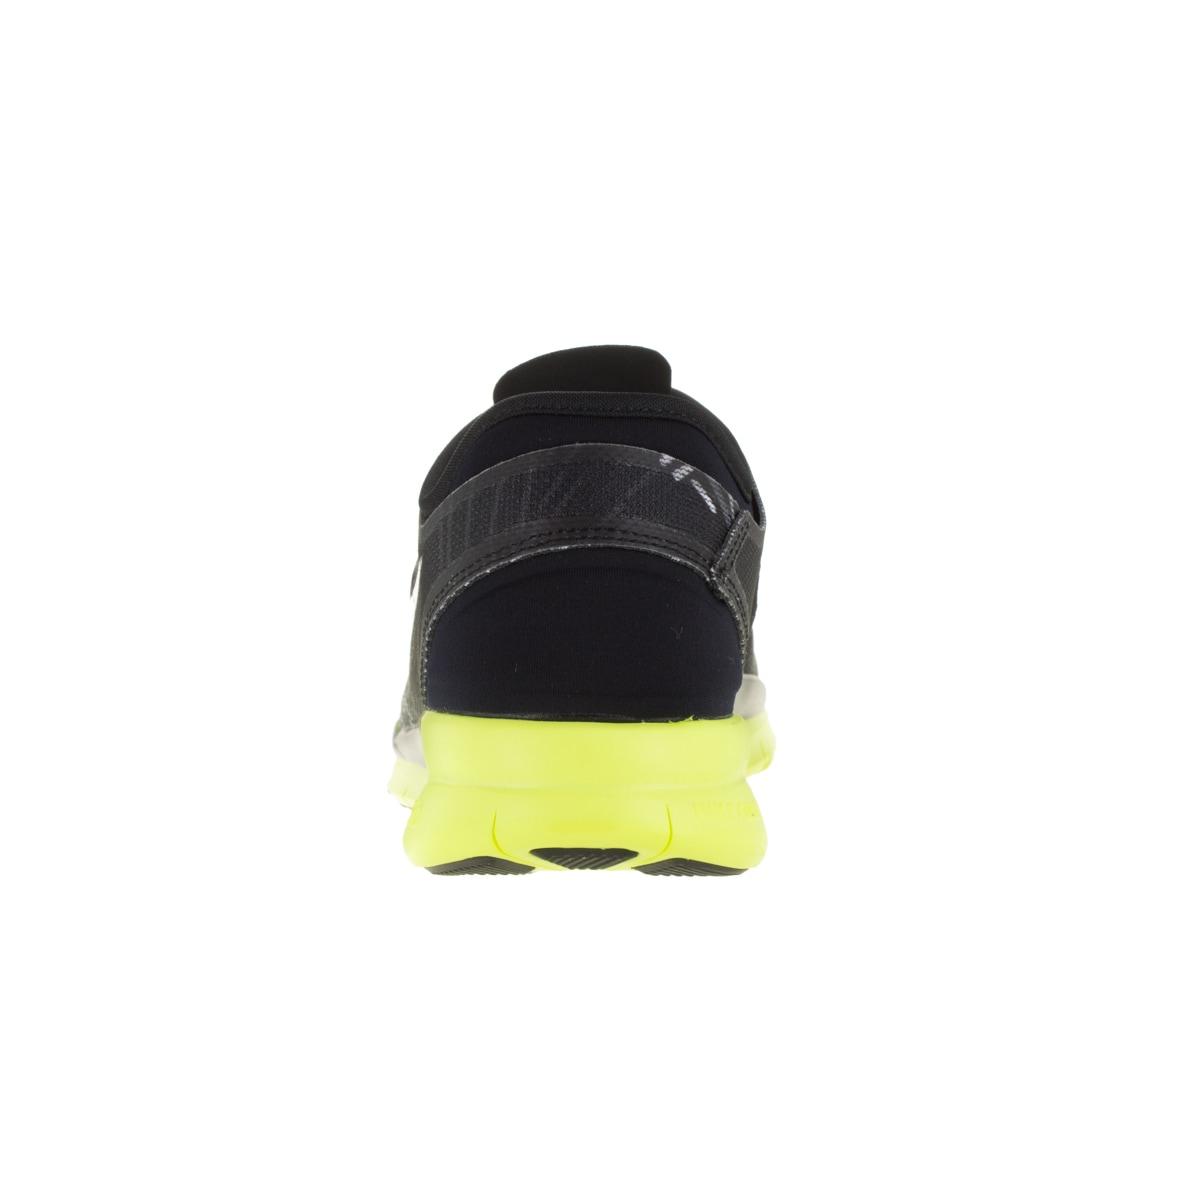 dc968ea7c752 Shop Nike Women s Free 5.0 Tr Fit 5 Prt Black Metallic Silver Volt Training  Shoe - Free Shipping Today - Overstock - 12321940